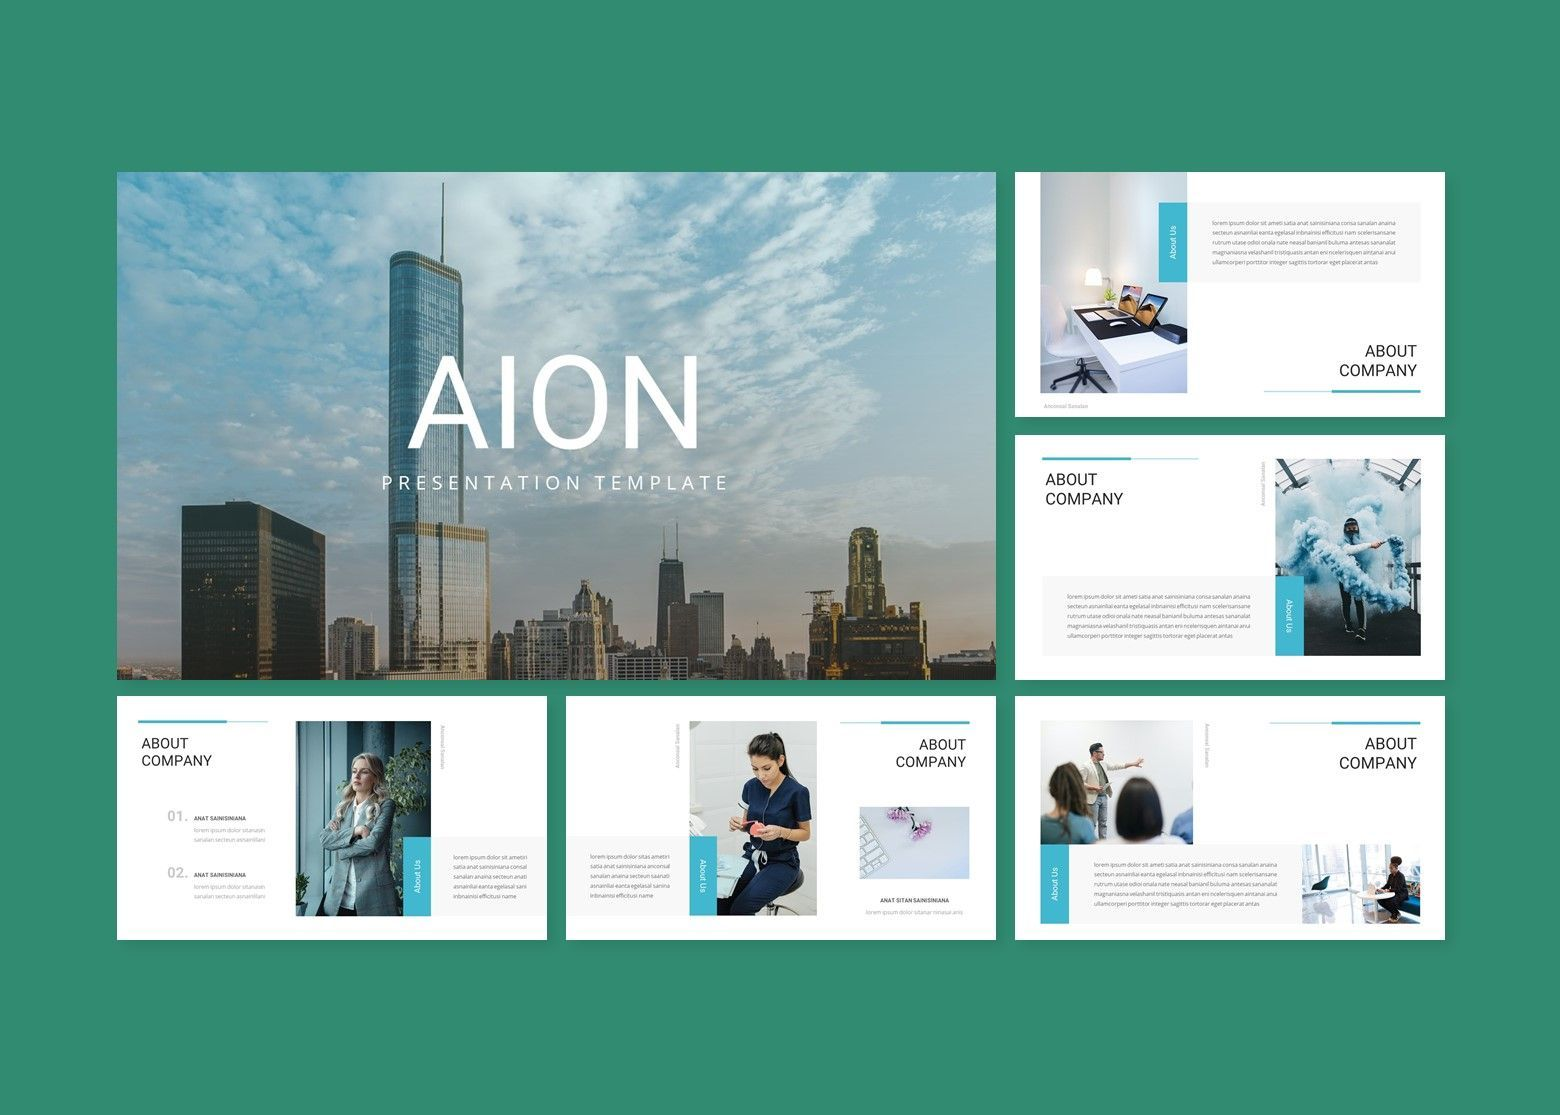 Aion Corporate Google Slides Template, Slide 2, 08151, Business Models — PoweredTemplate.com